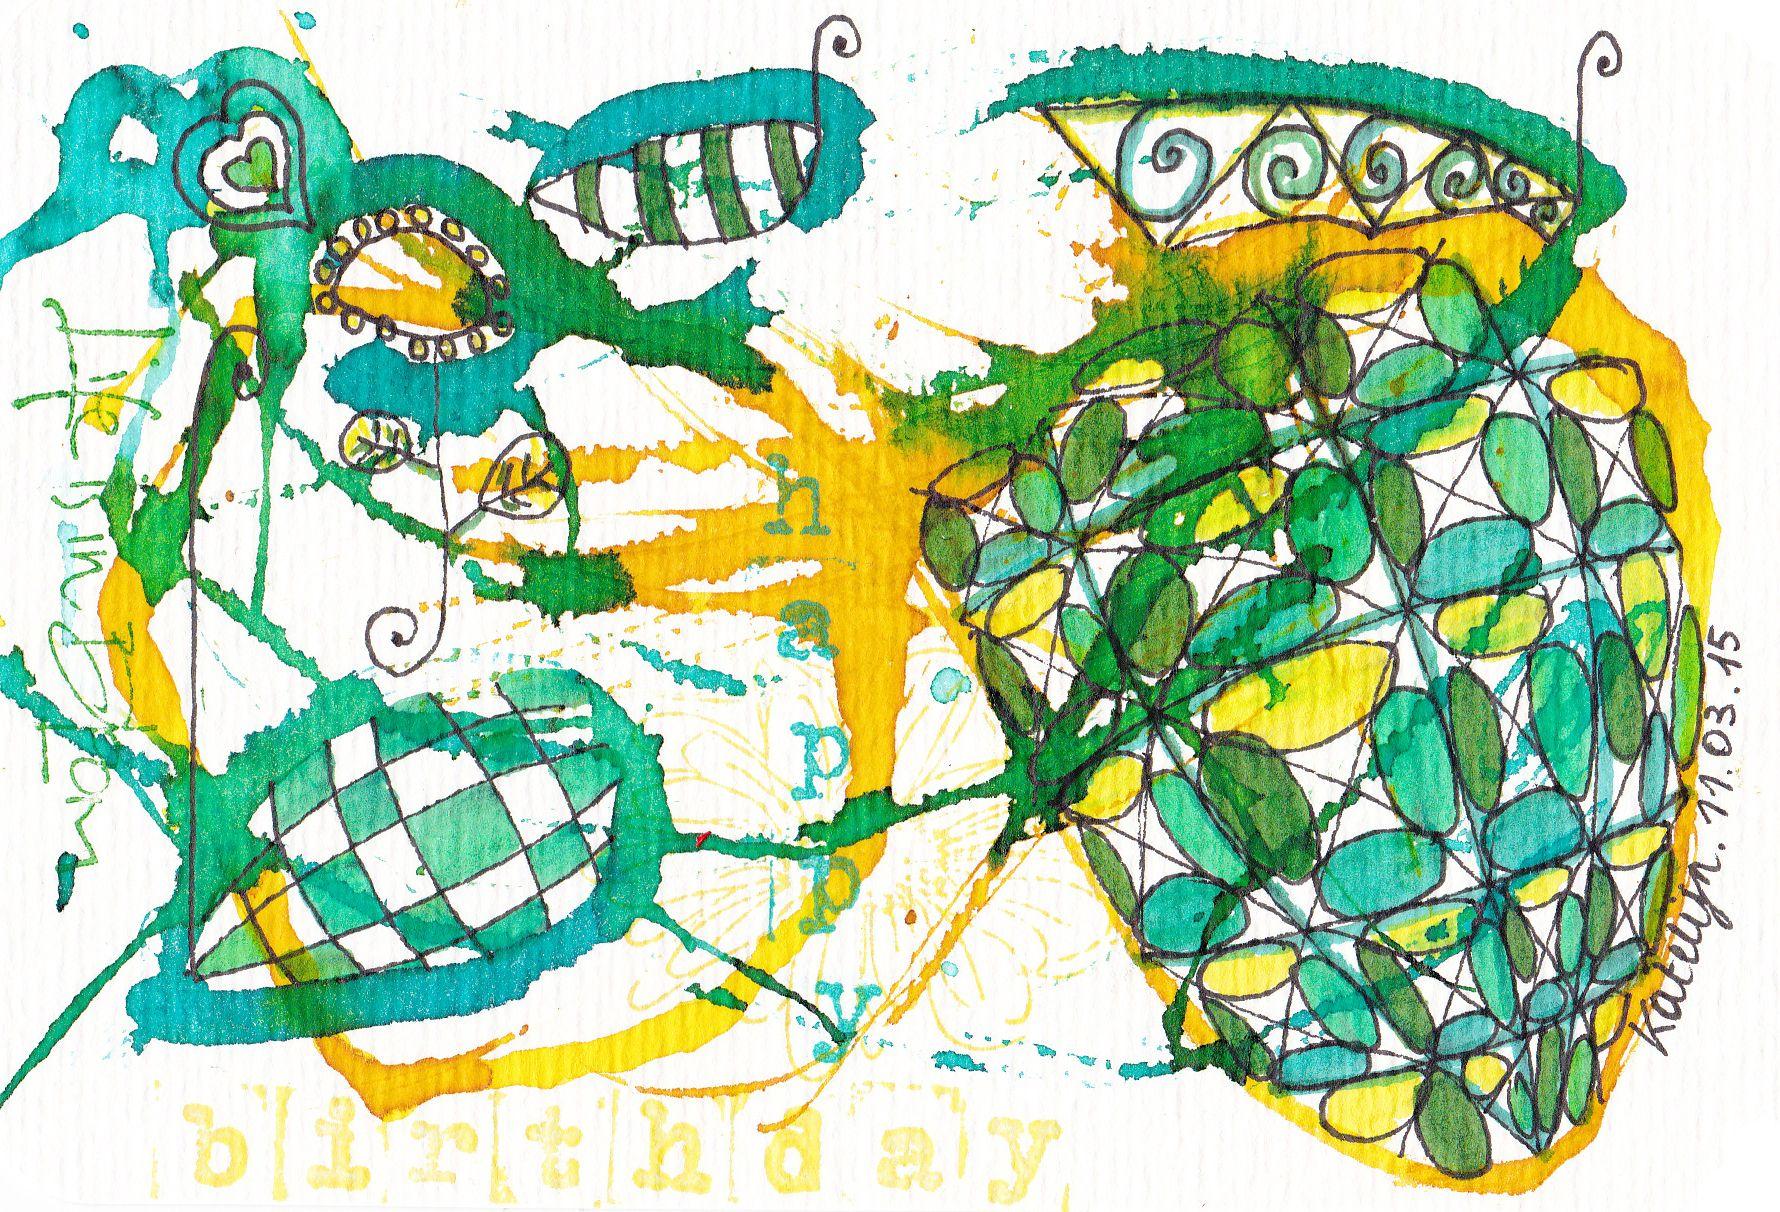 Birthday Card Ecoline Zentangle